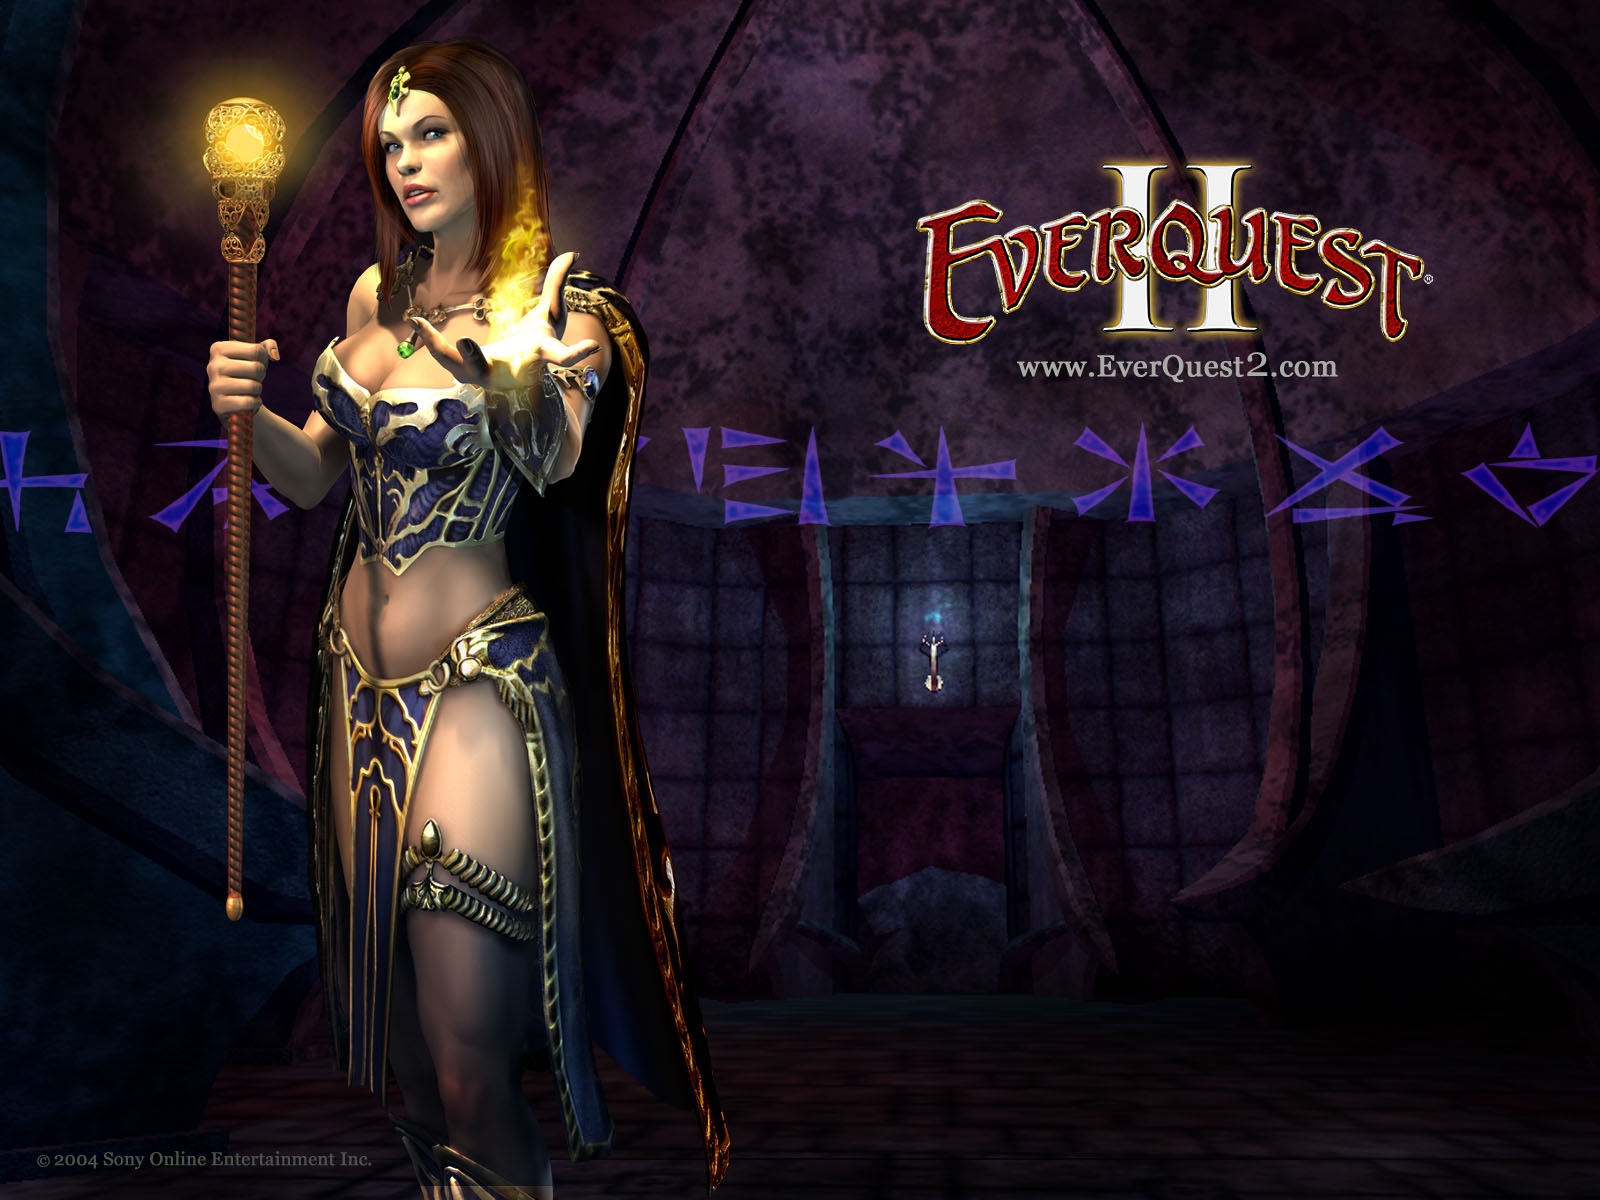 http://2.bp.blogspot.com/_AMs_jnoV0_4/SshZhlwRF1I/AAAAAAAAABU/hPoaXUS7q3E/s1600/EverQuest_II_%28EQ2%29_MMORPG%5B1%5D.jpg